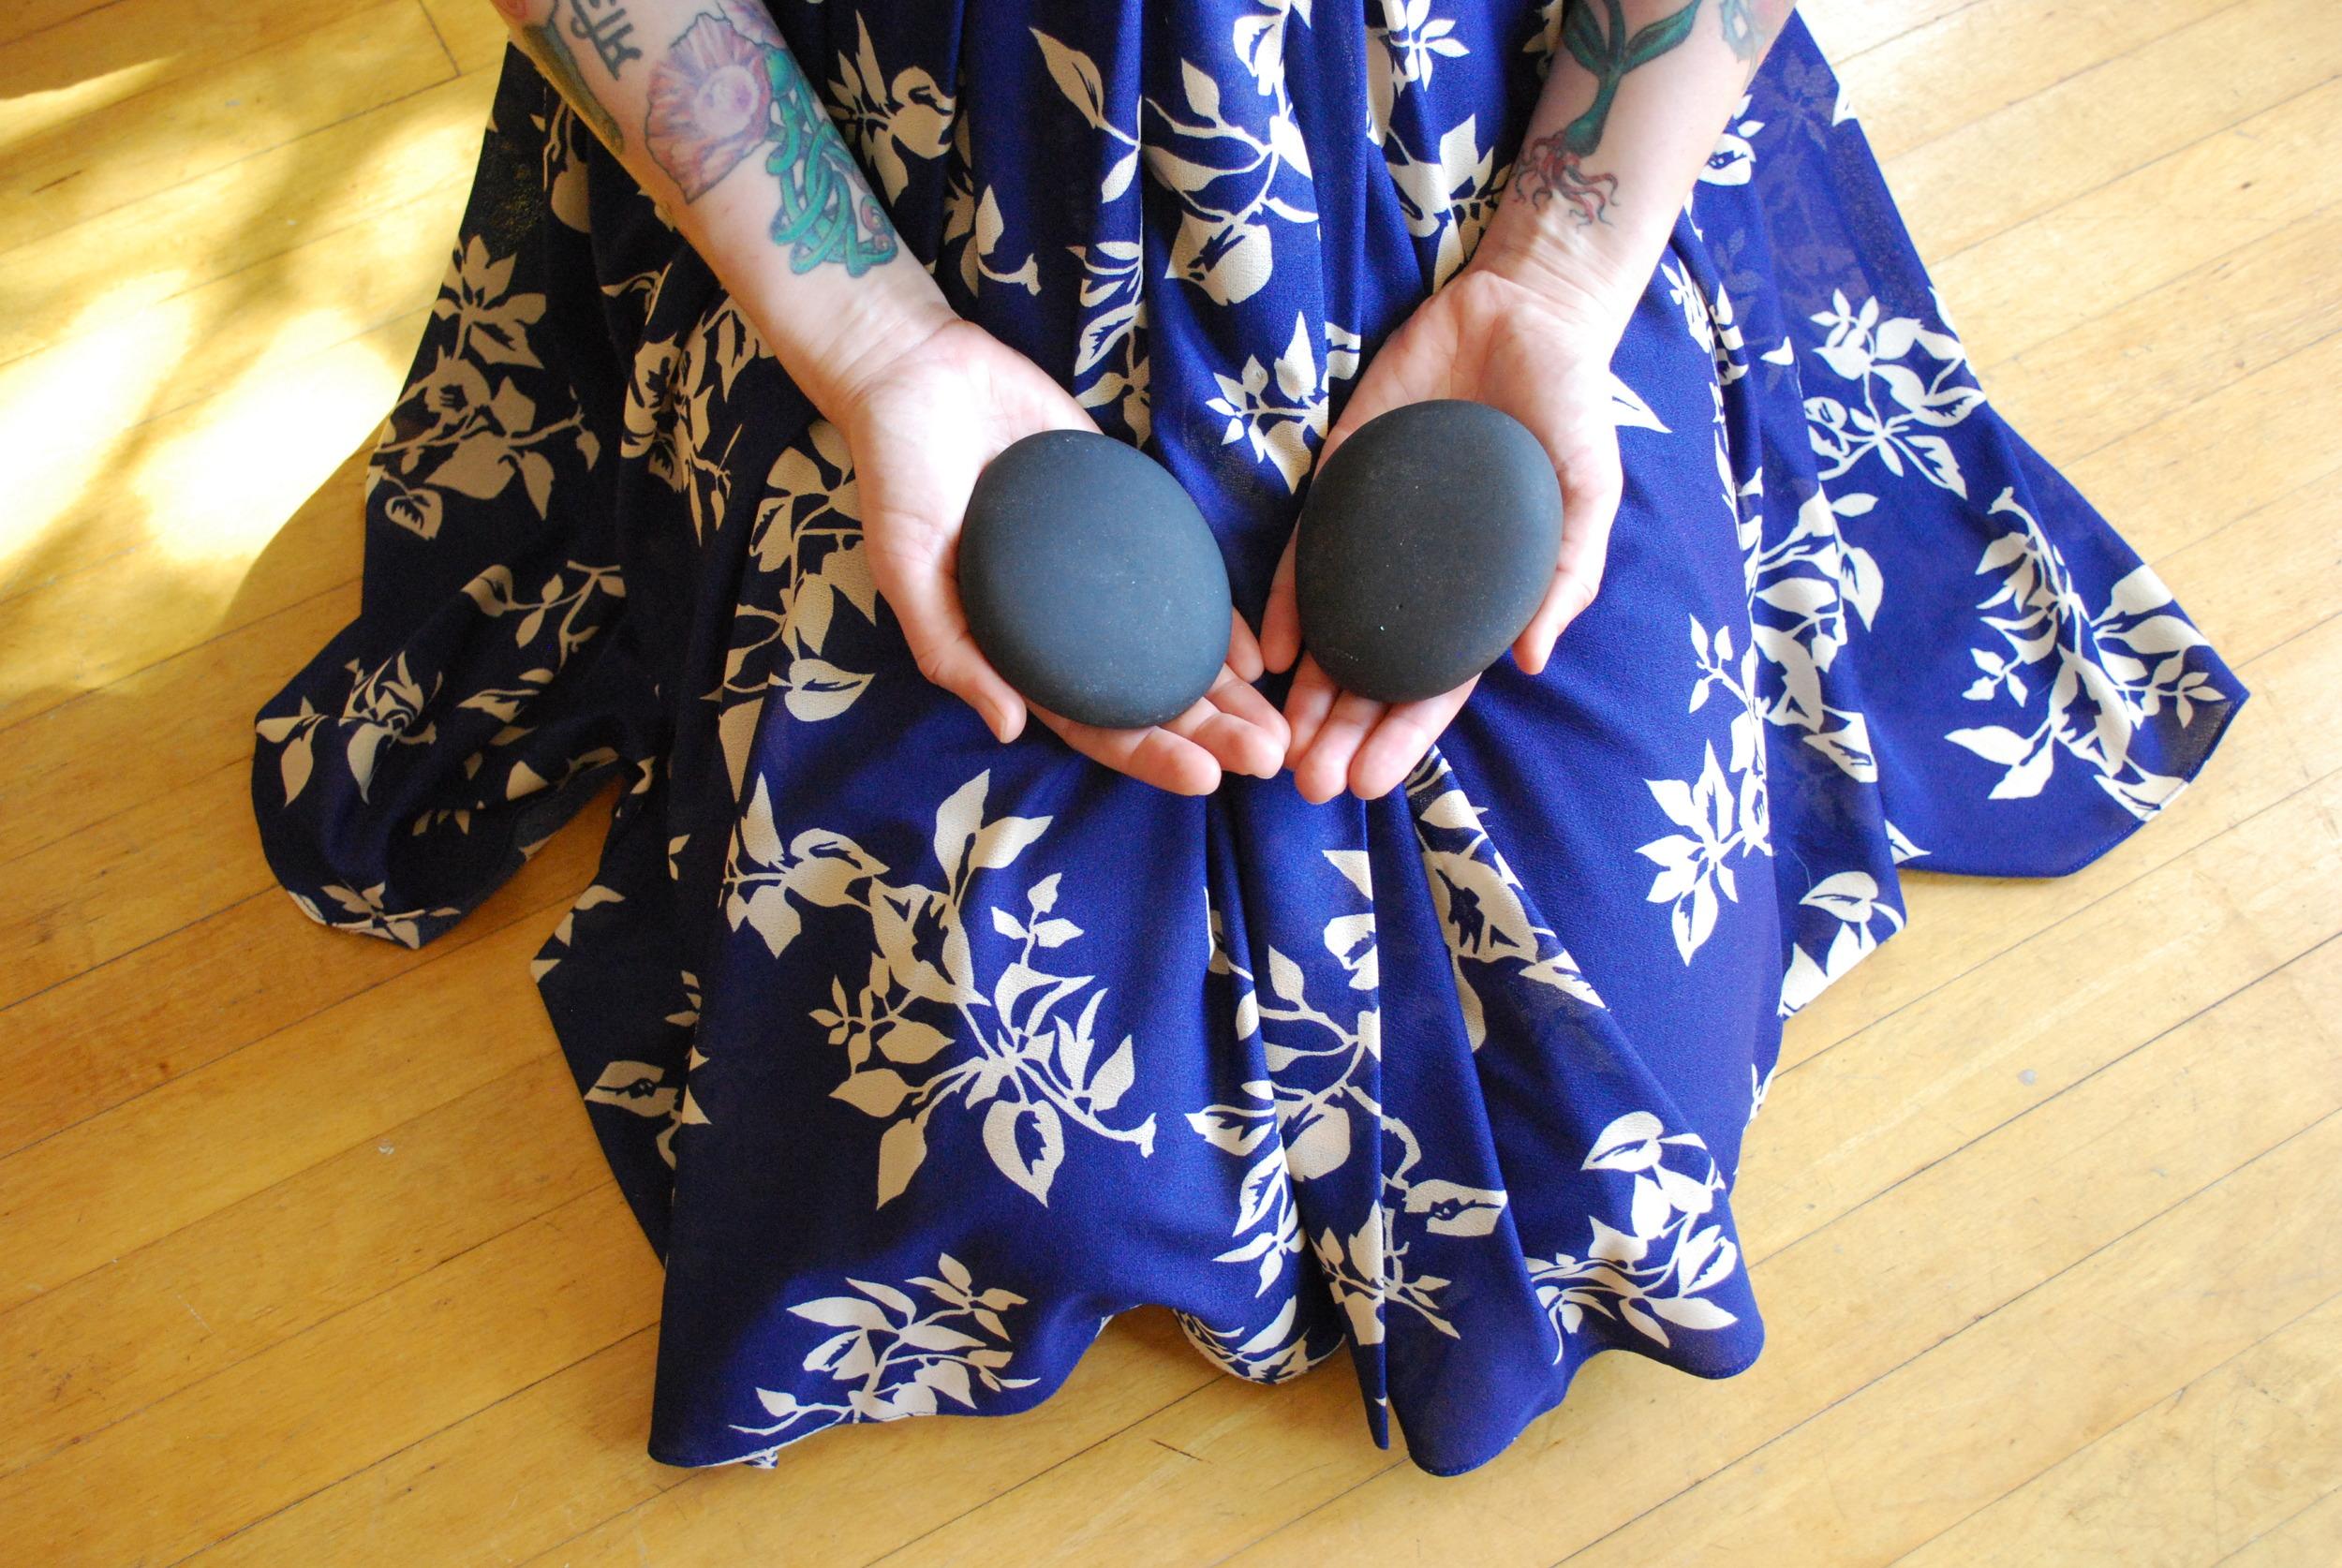 Basalt Stones, Hot Stone Massage at Thai Massage at Samsara Wellness Center: Yoga, Massage & Tattoo in Bakersfield, California